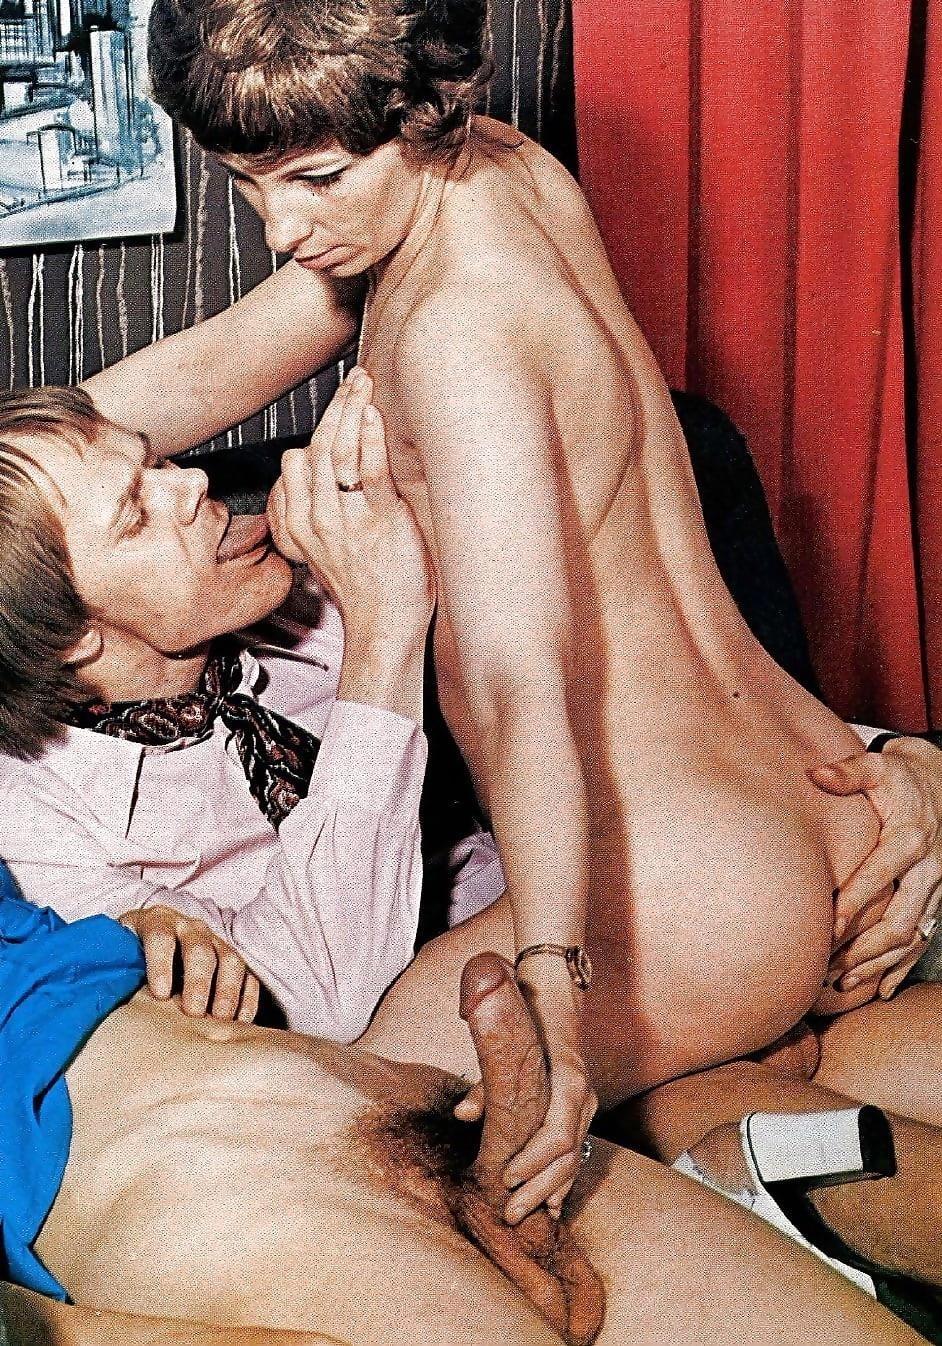 Porn threesome amateur-6306